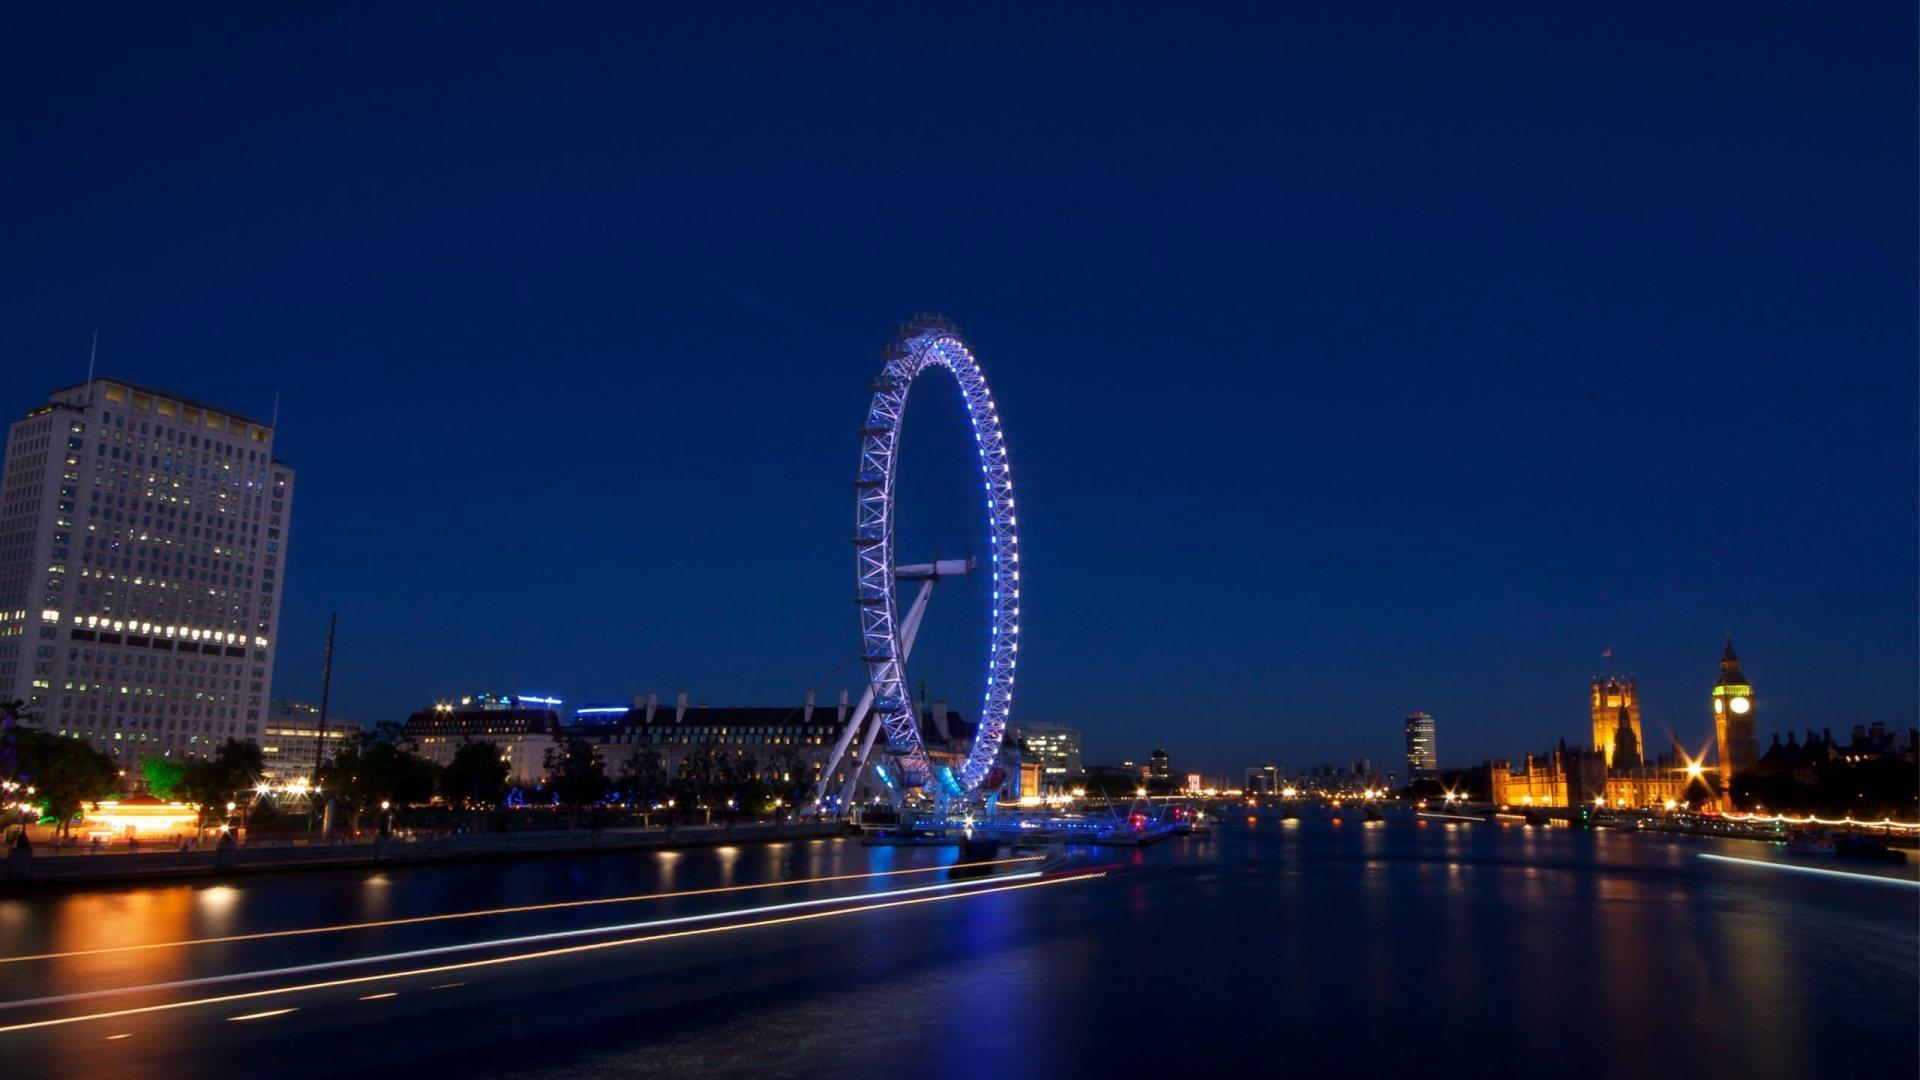 City night Scene | Full HD Desktop Wallpapers 1080p